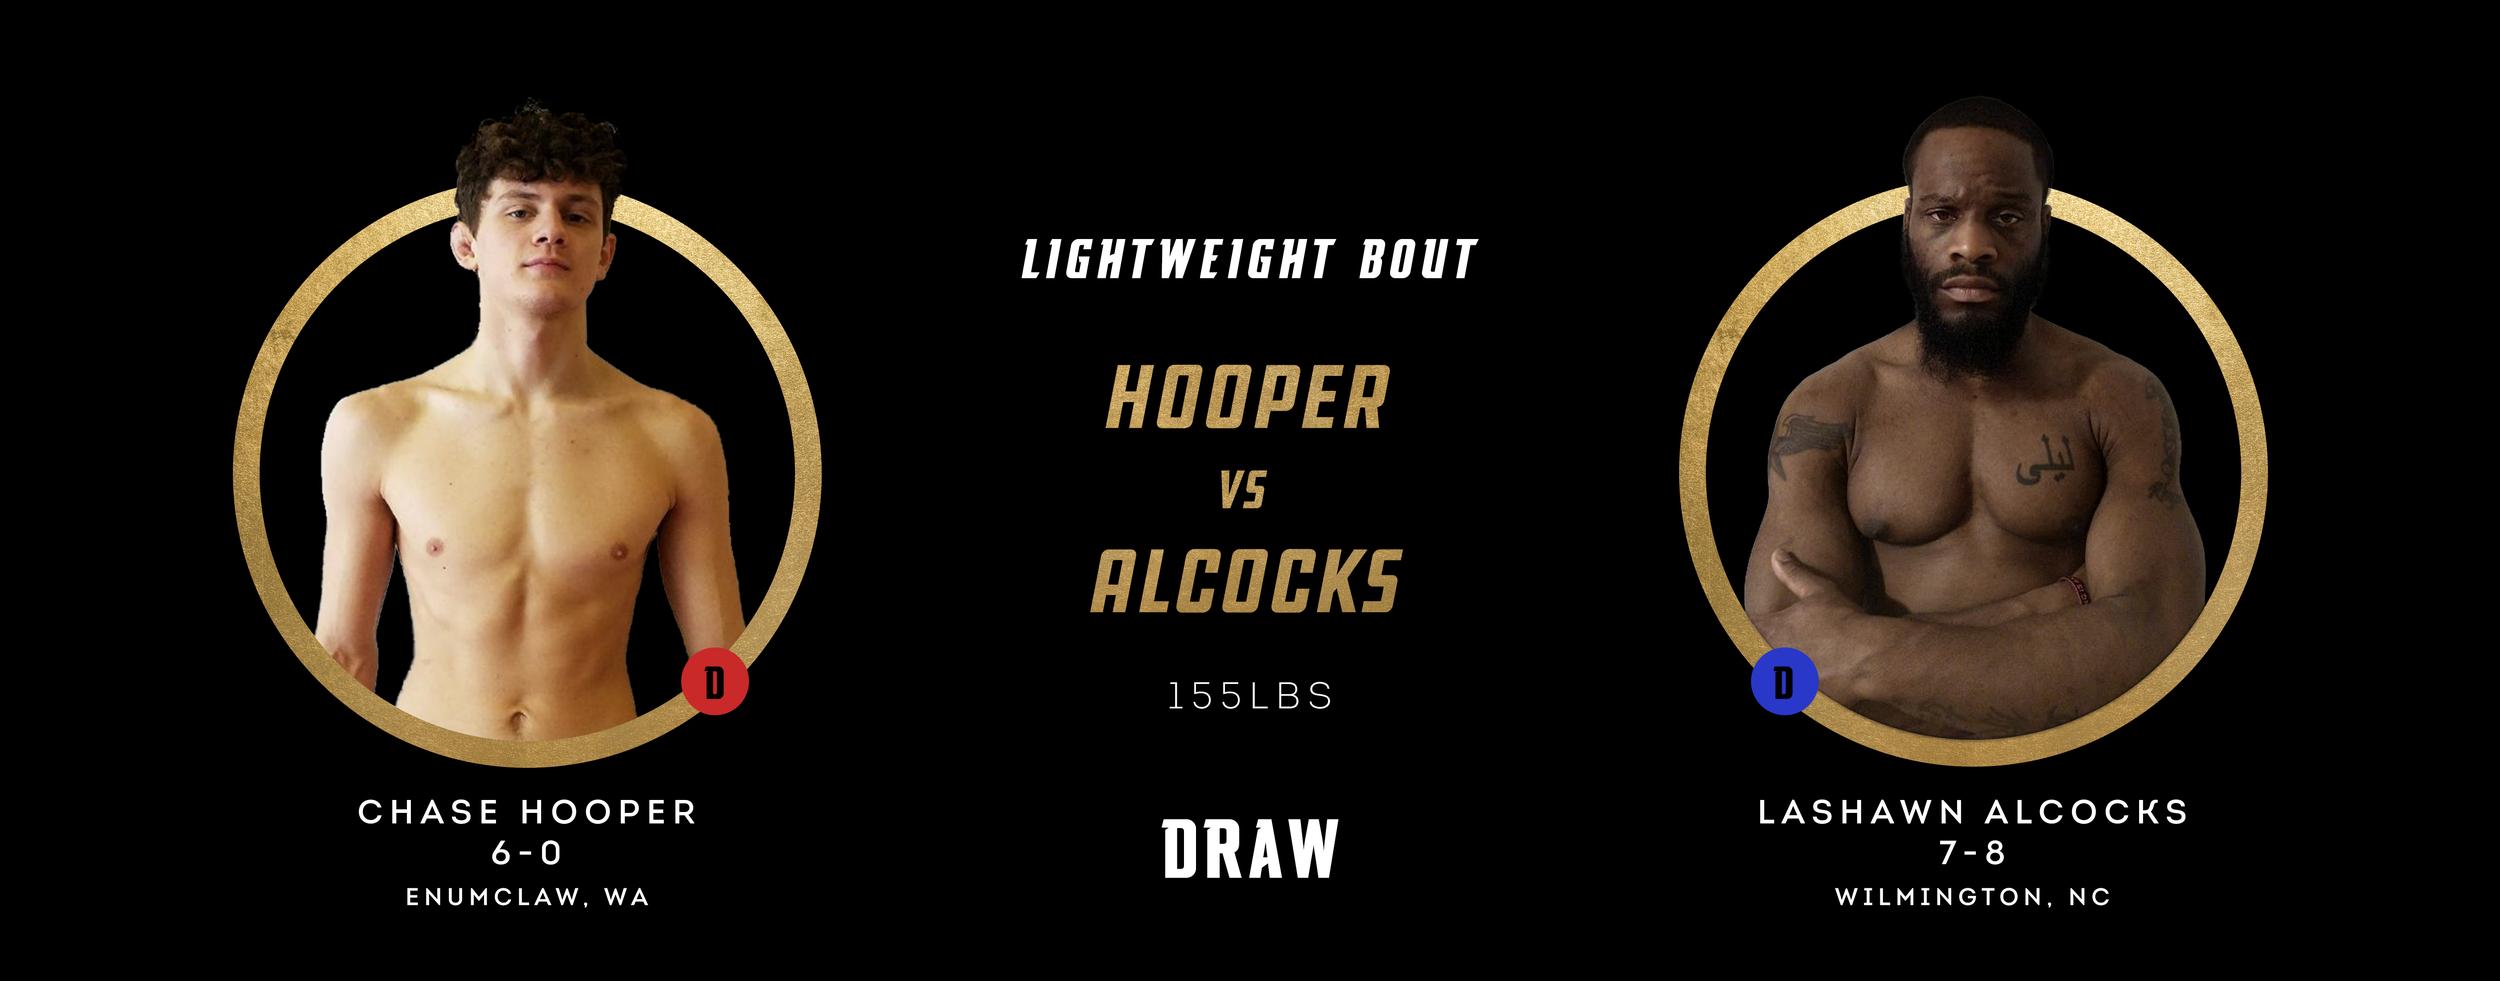 Hooper_VS_Alcocks.png